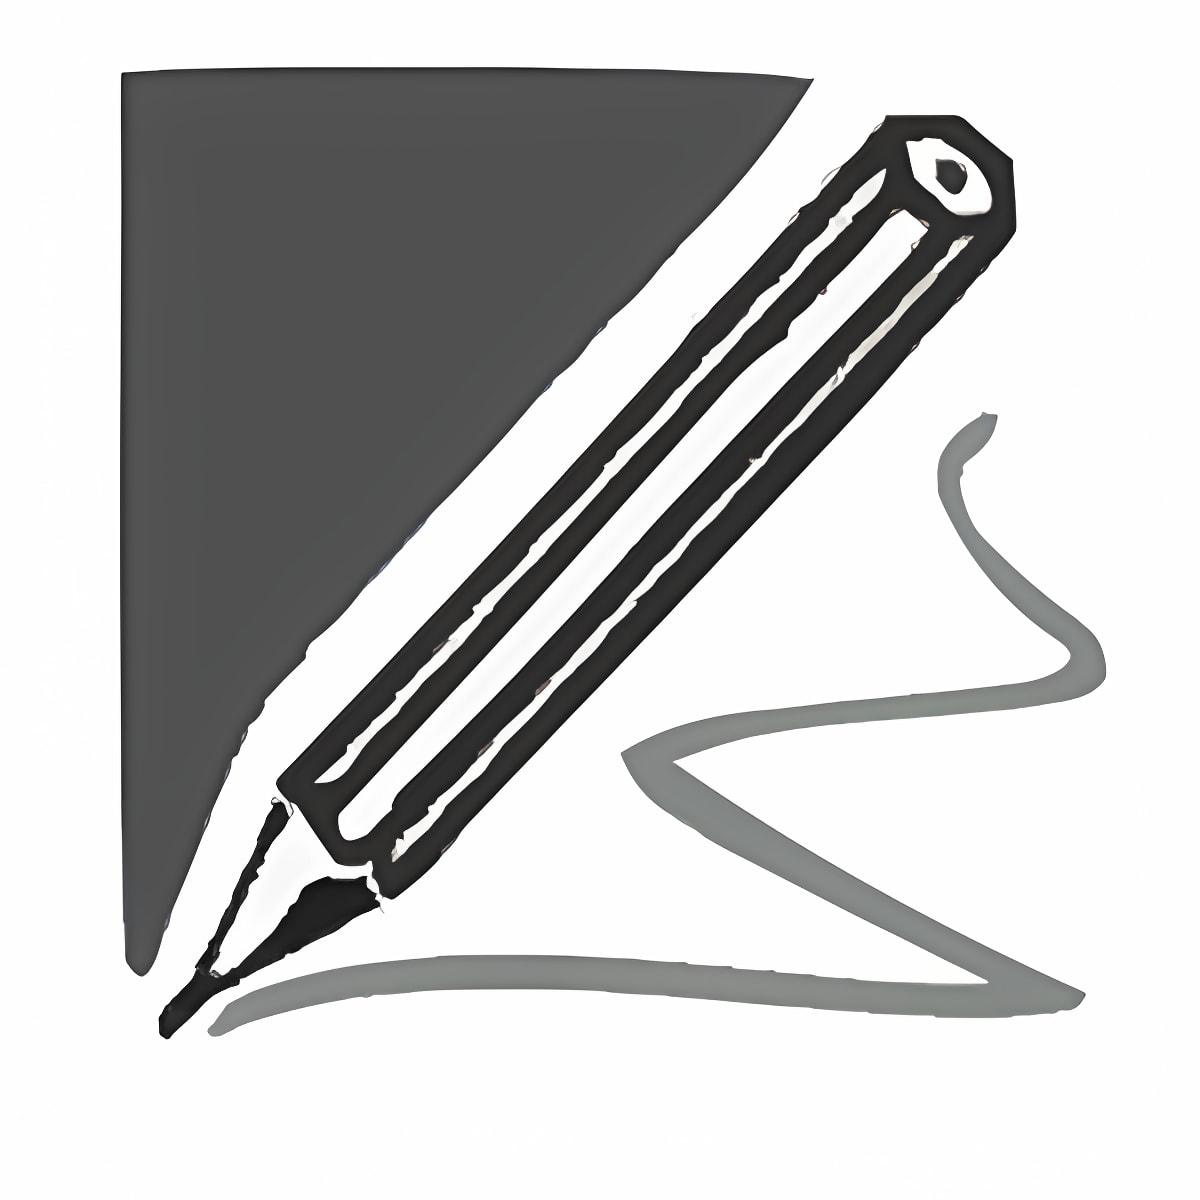 Explore Drafting